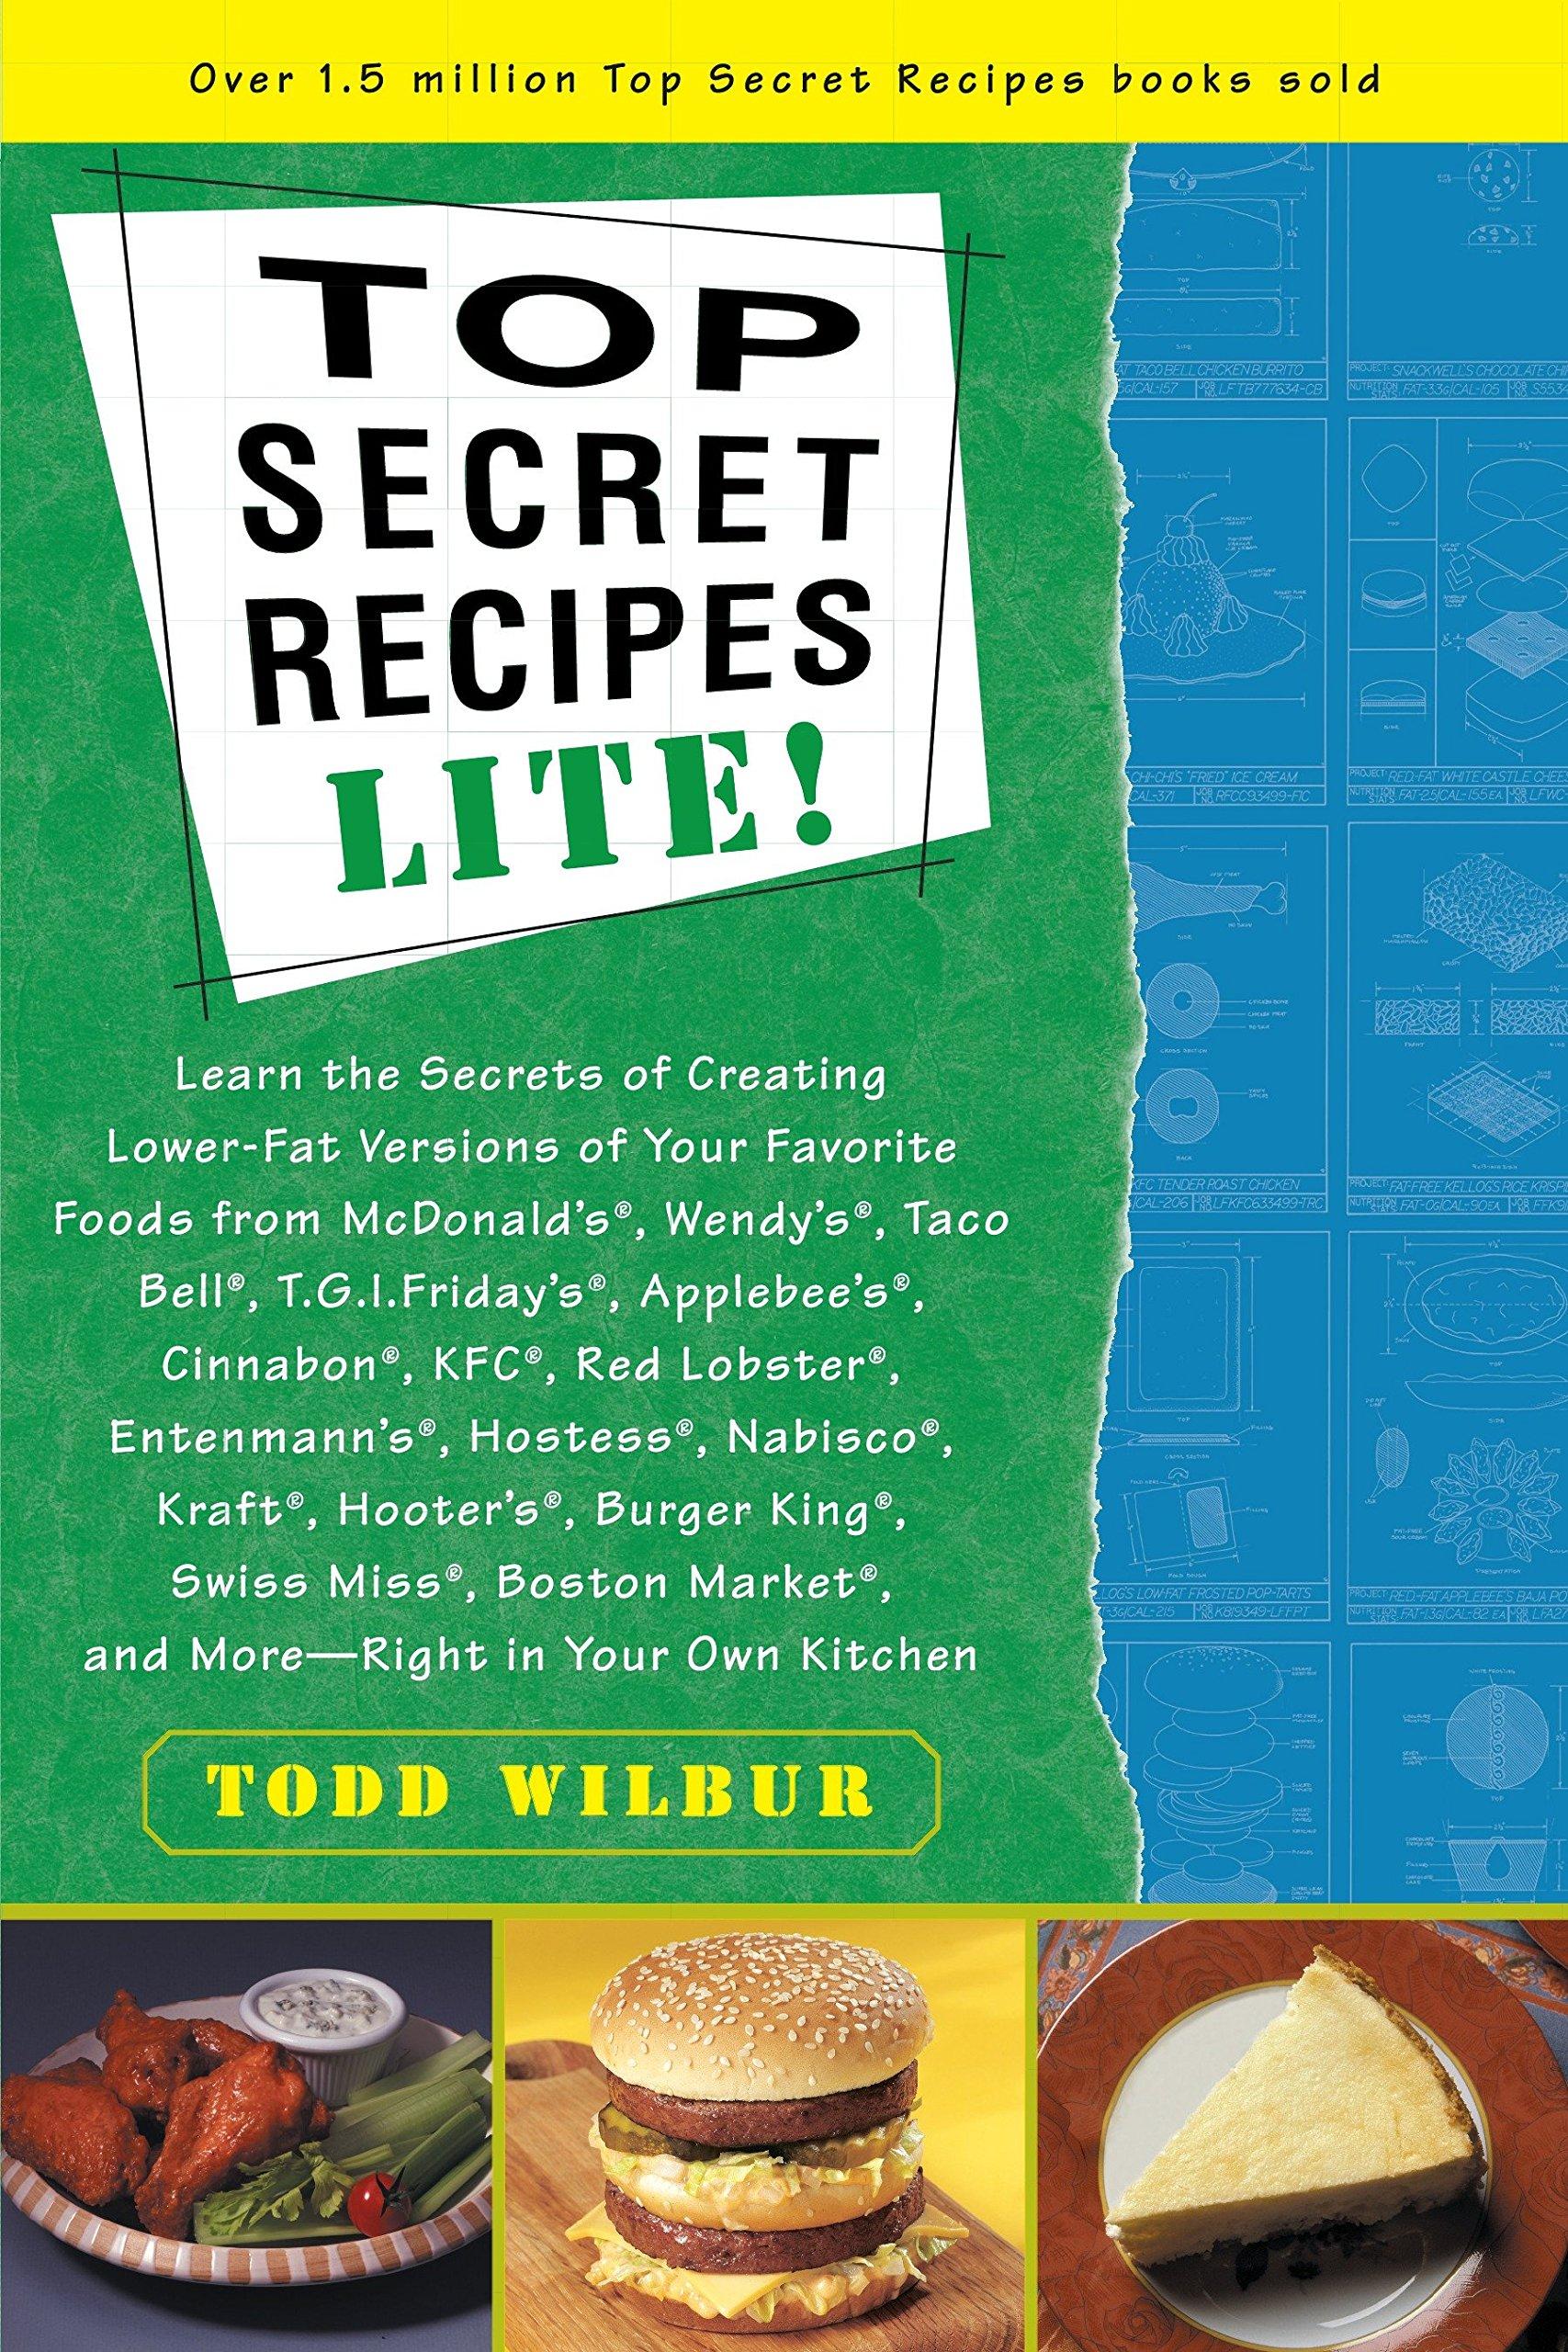 Top Secret Recipes Lite!: Todd Wilbur: 9780452280144: Amazon com: Books